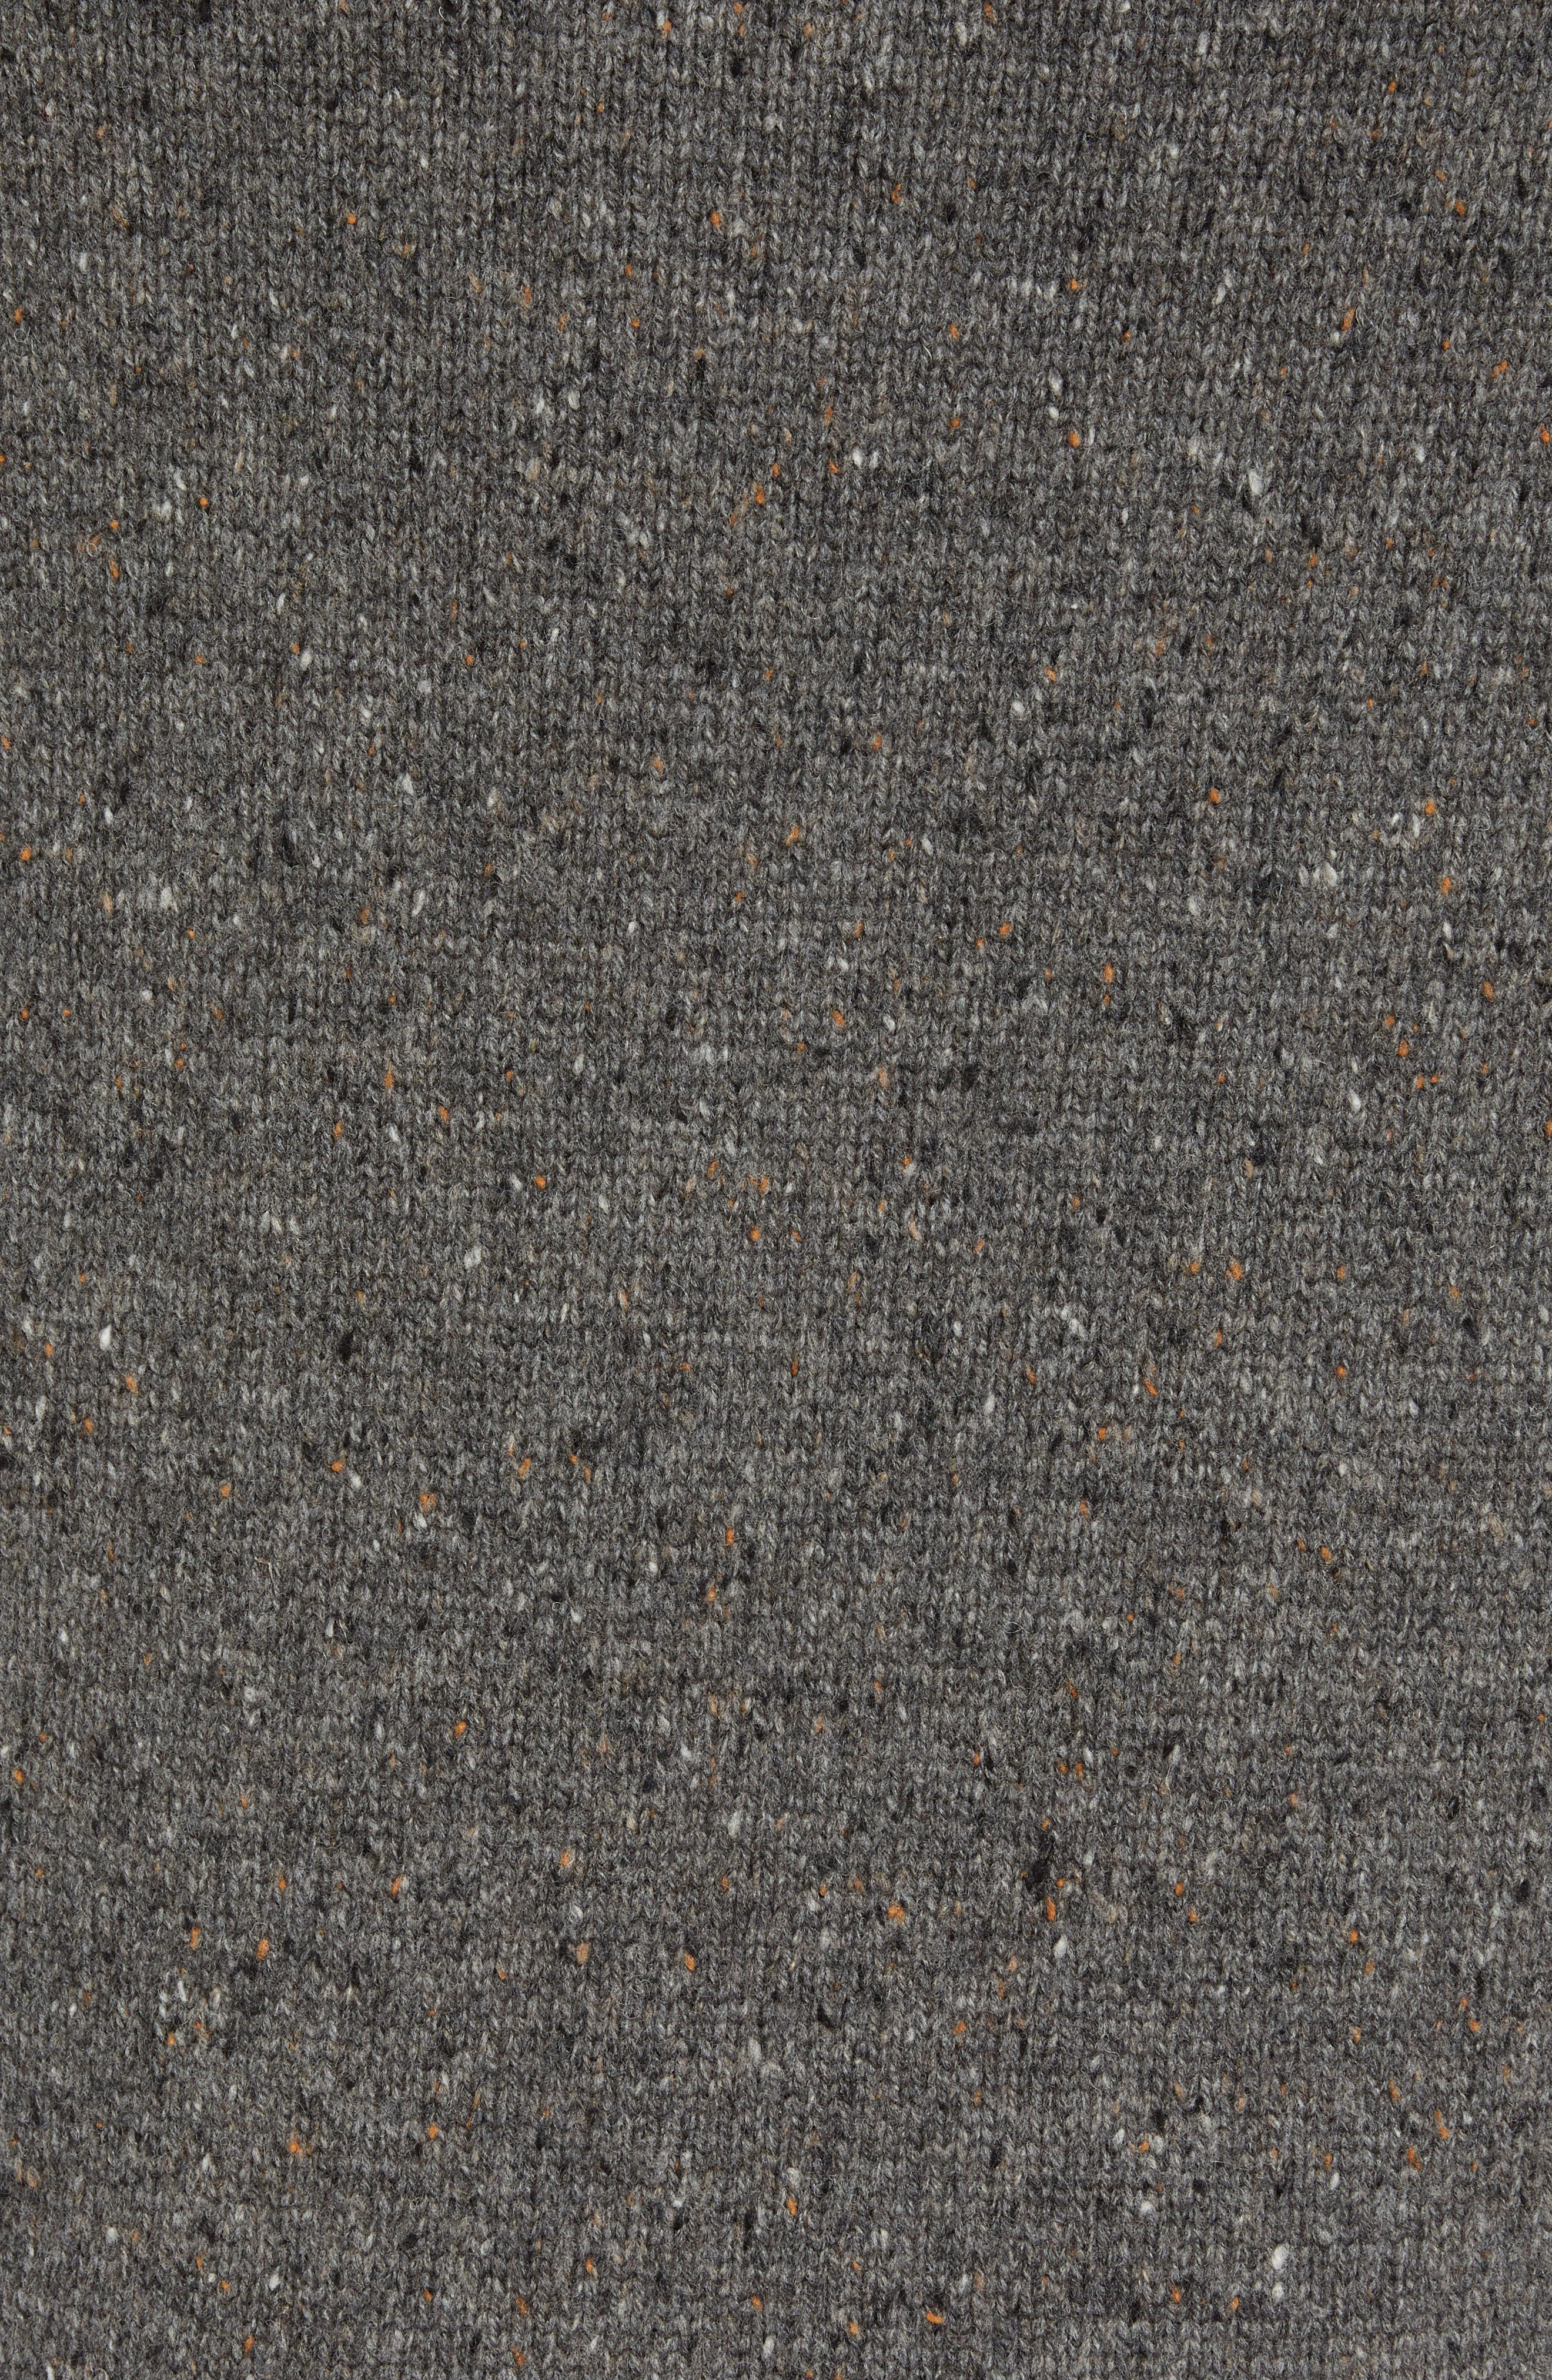 Jaxon Trim Fit Wool Sweater,                             Alternate thumbnail 5, color,                             GREY MULTI